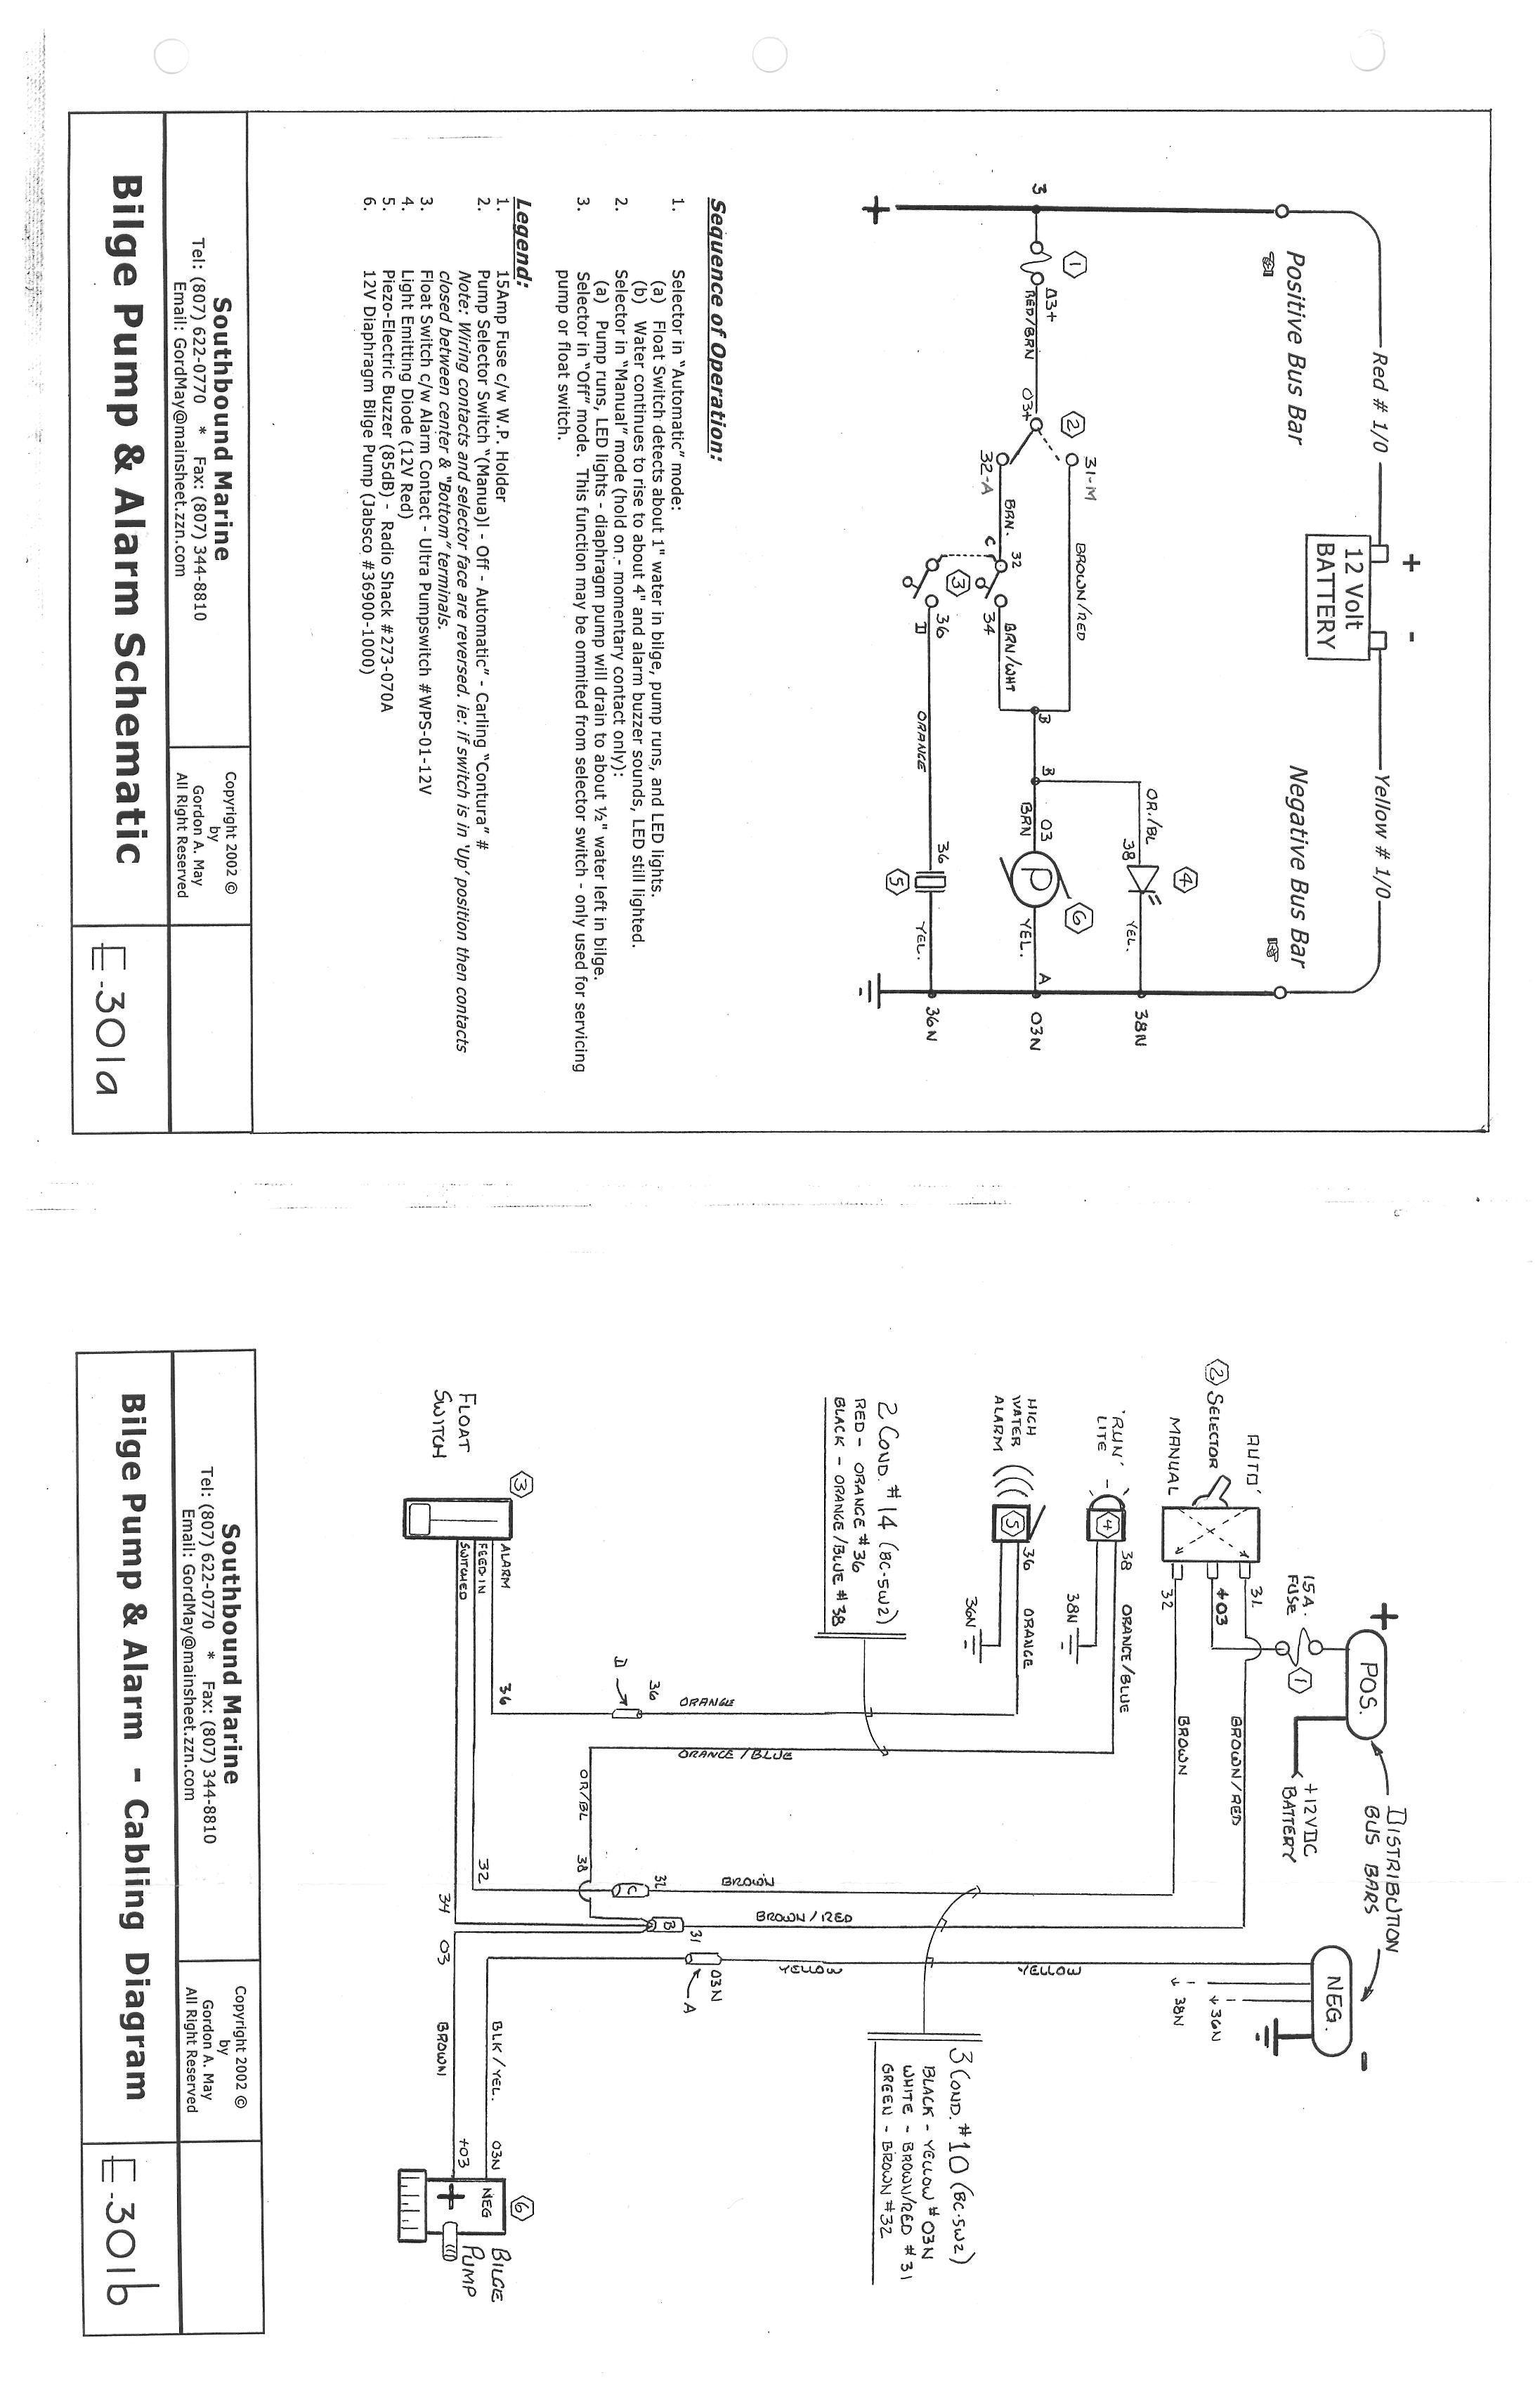 Schematic Bilge Pump Amp Alarm E 301a